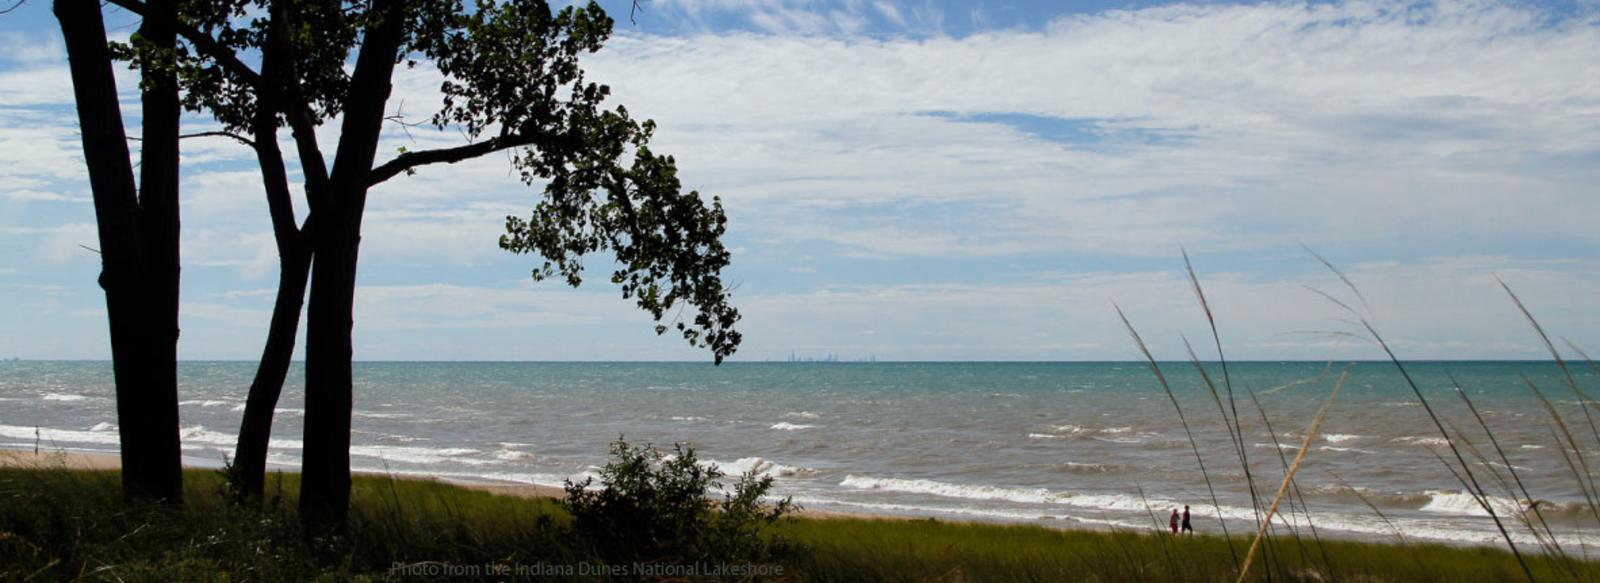 Lake-View-Indiana-Dunes-Lake-Michigan-South-Shore